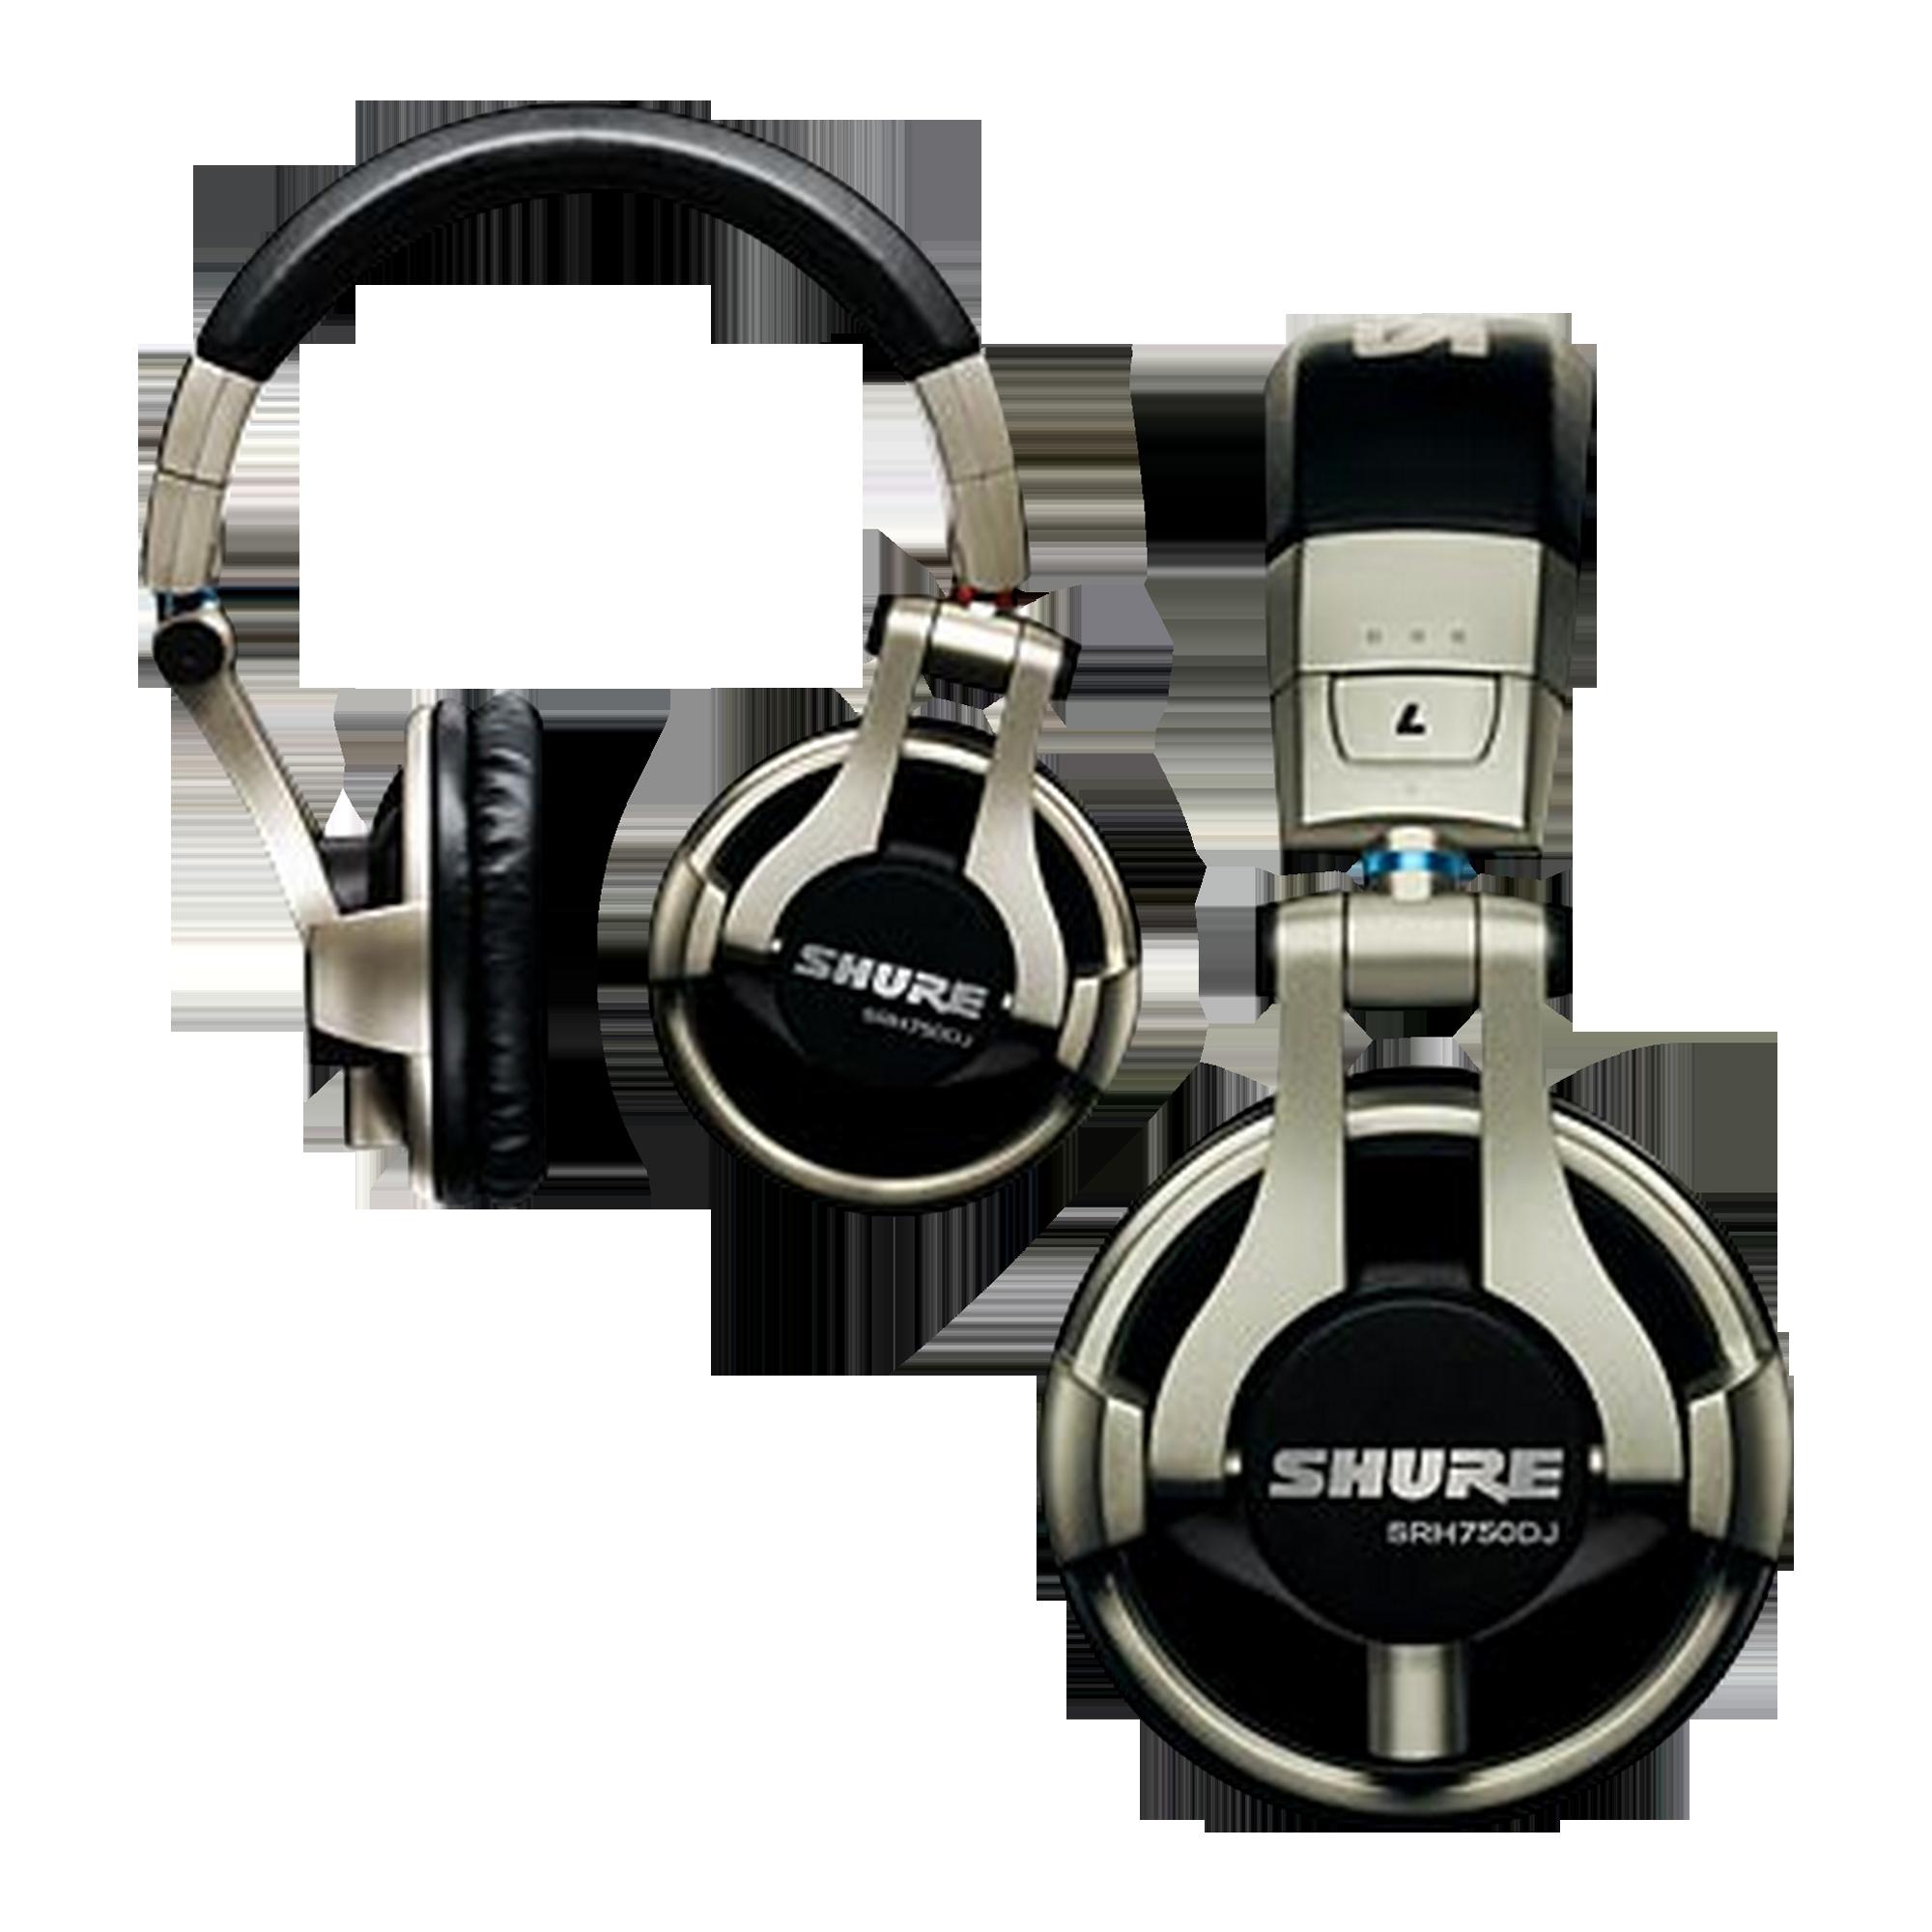 Shure SRH550DJ Professional DJ Headphones  LiveSoundwave  headphones ... f1cf4fe4a567